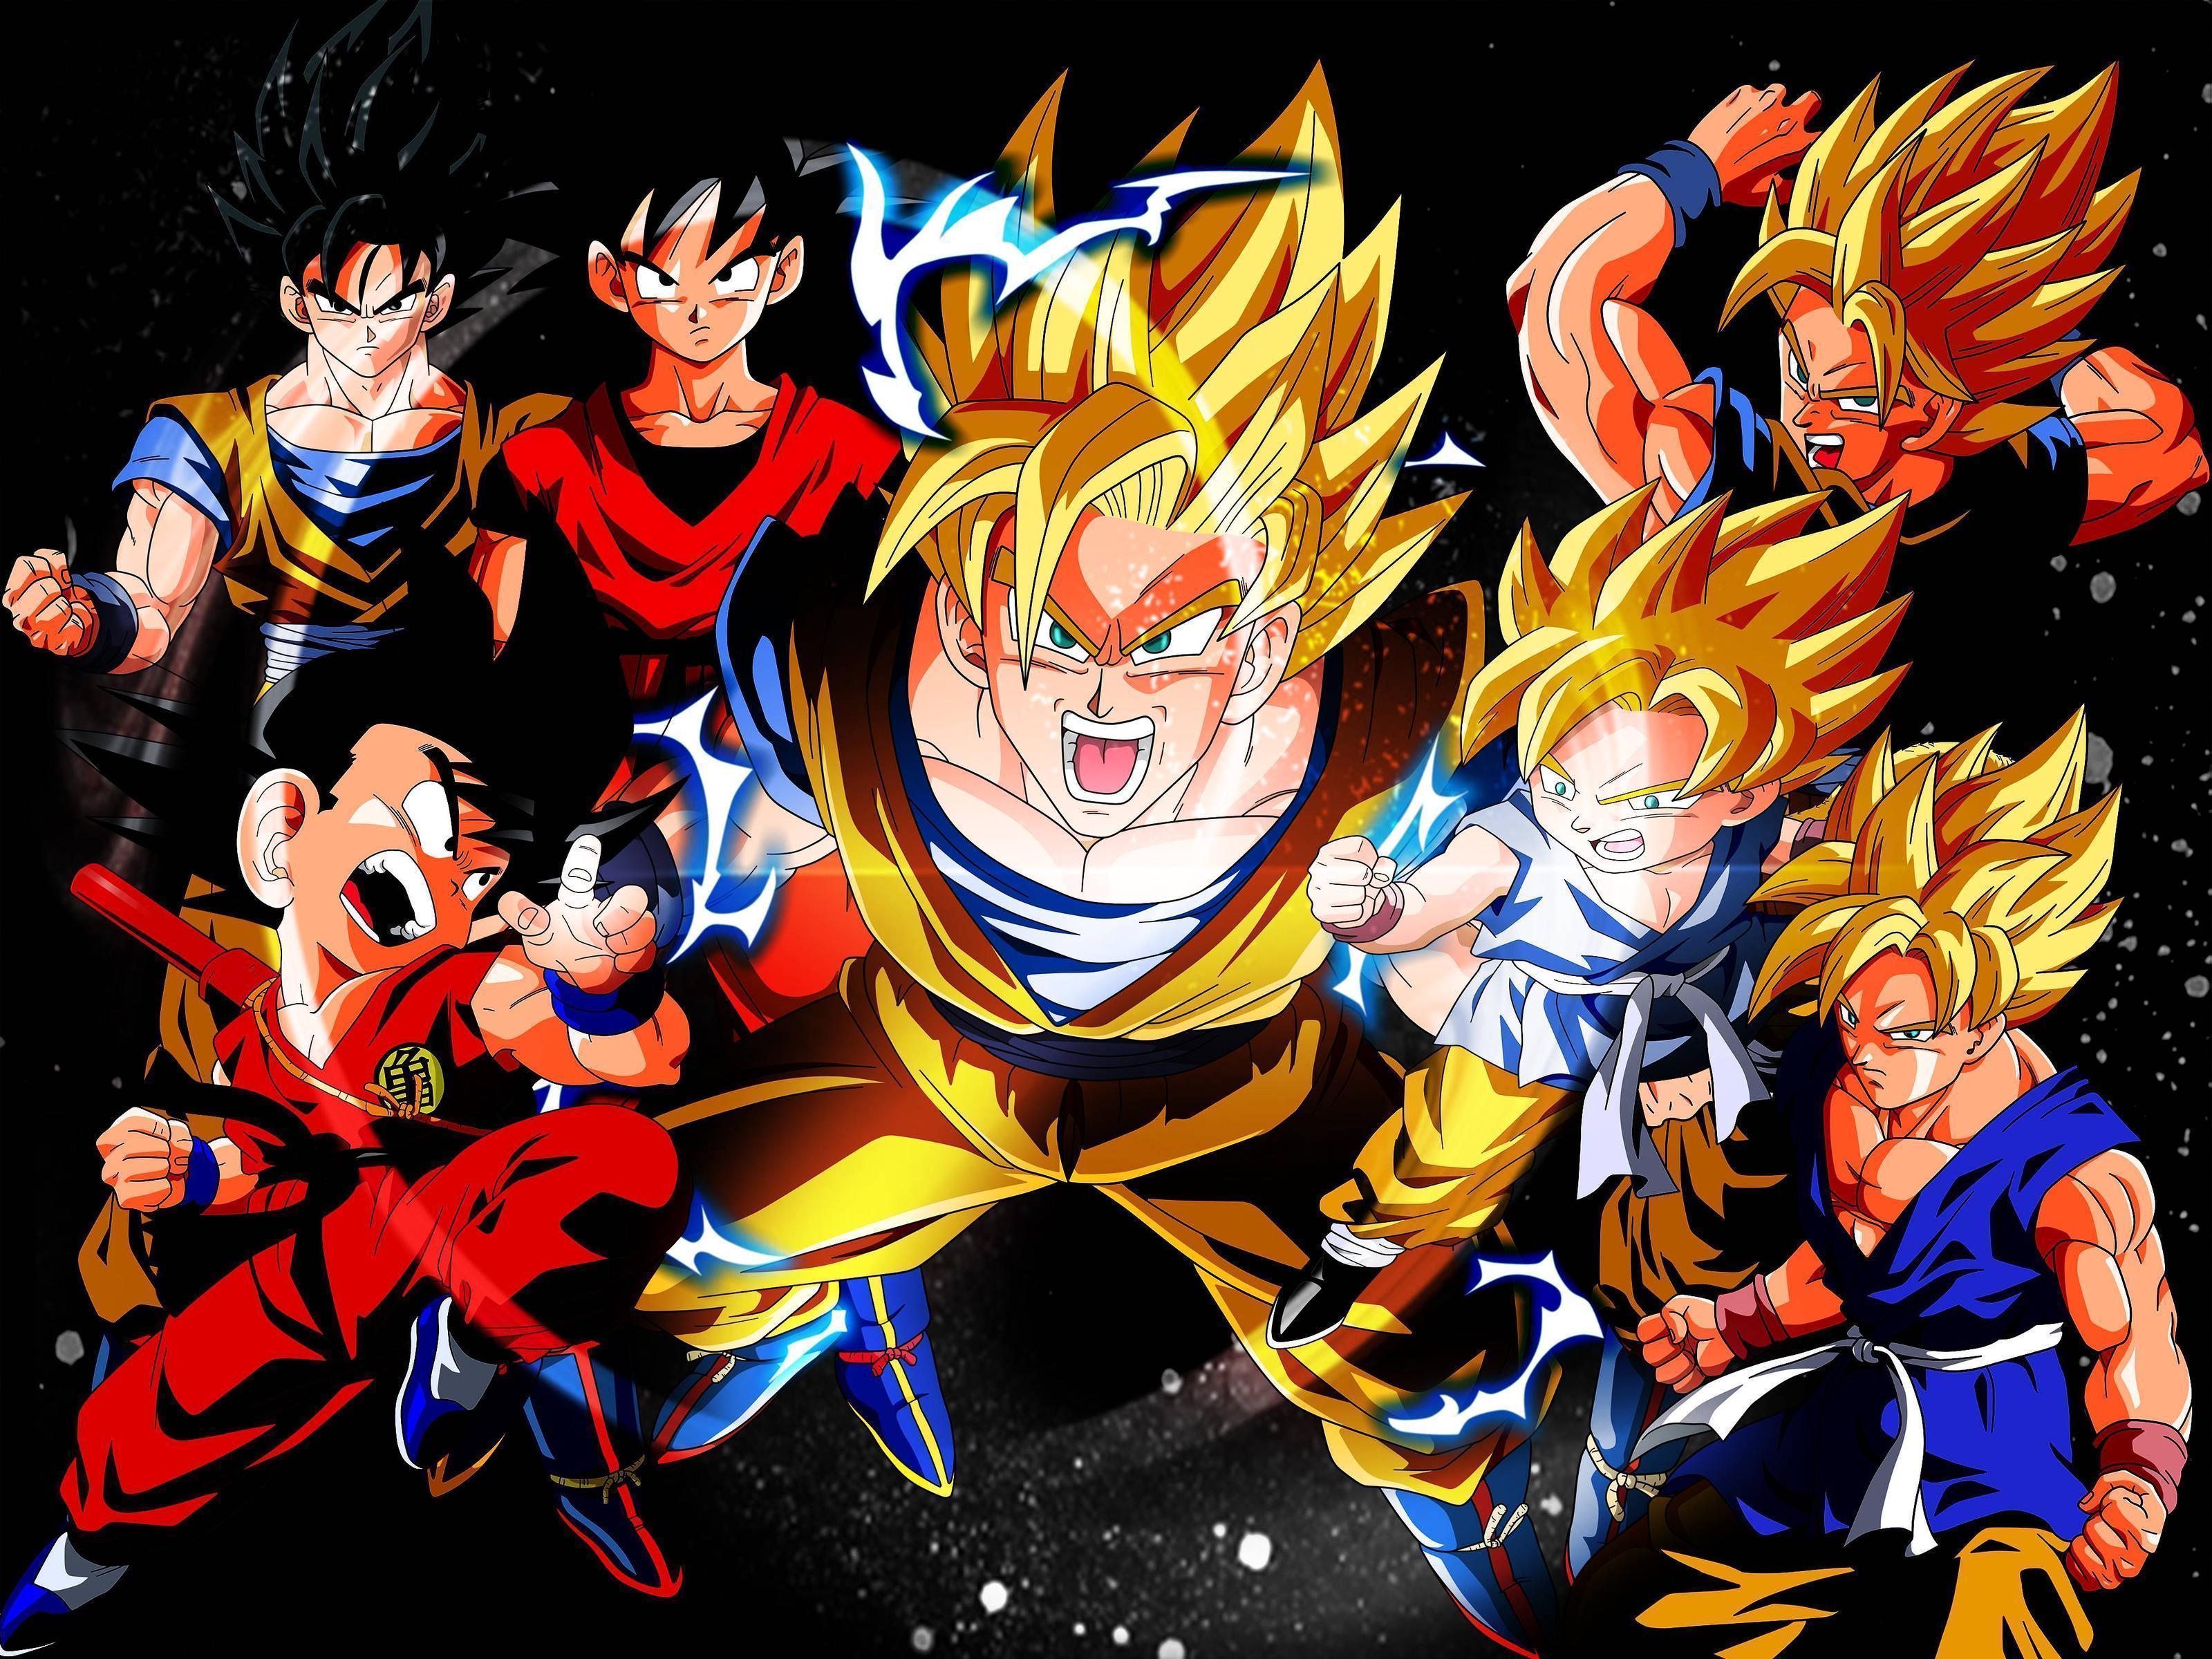 Goku Wallpaper by acidlullaby08 on DeviantArt